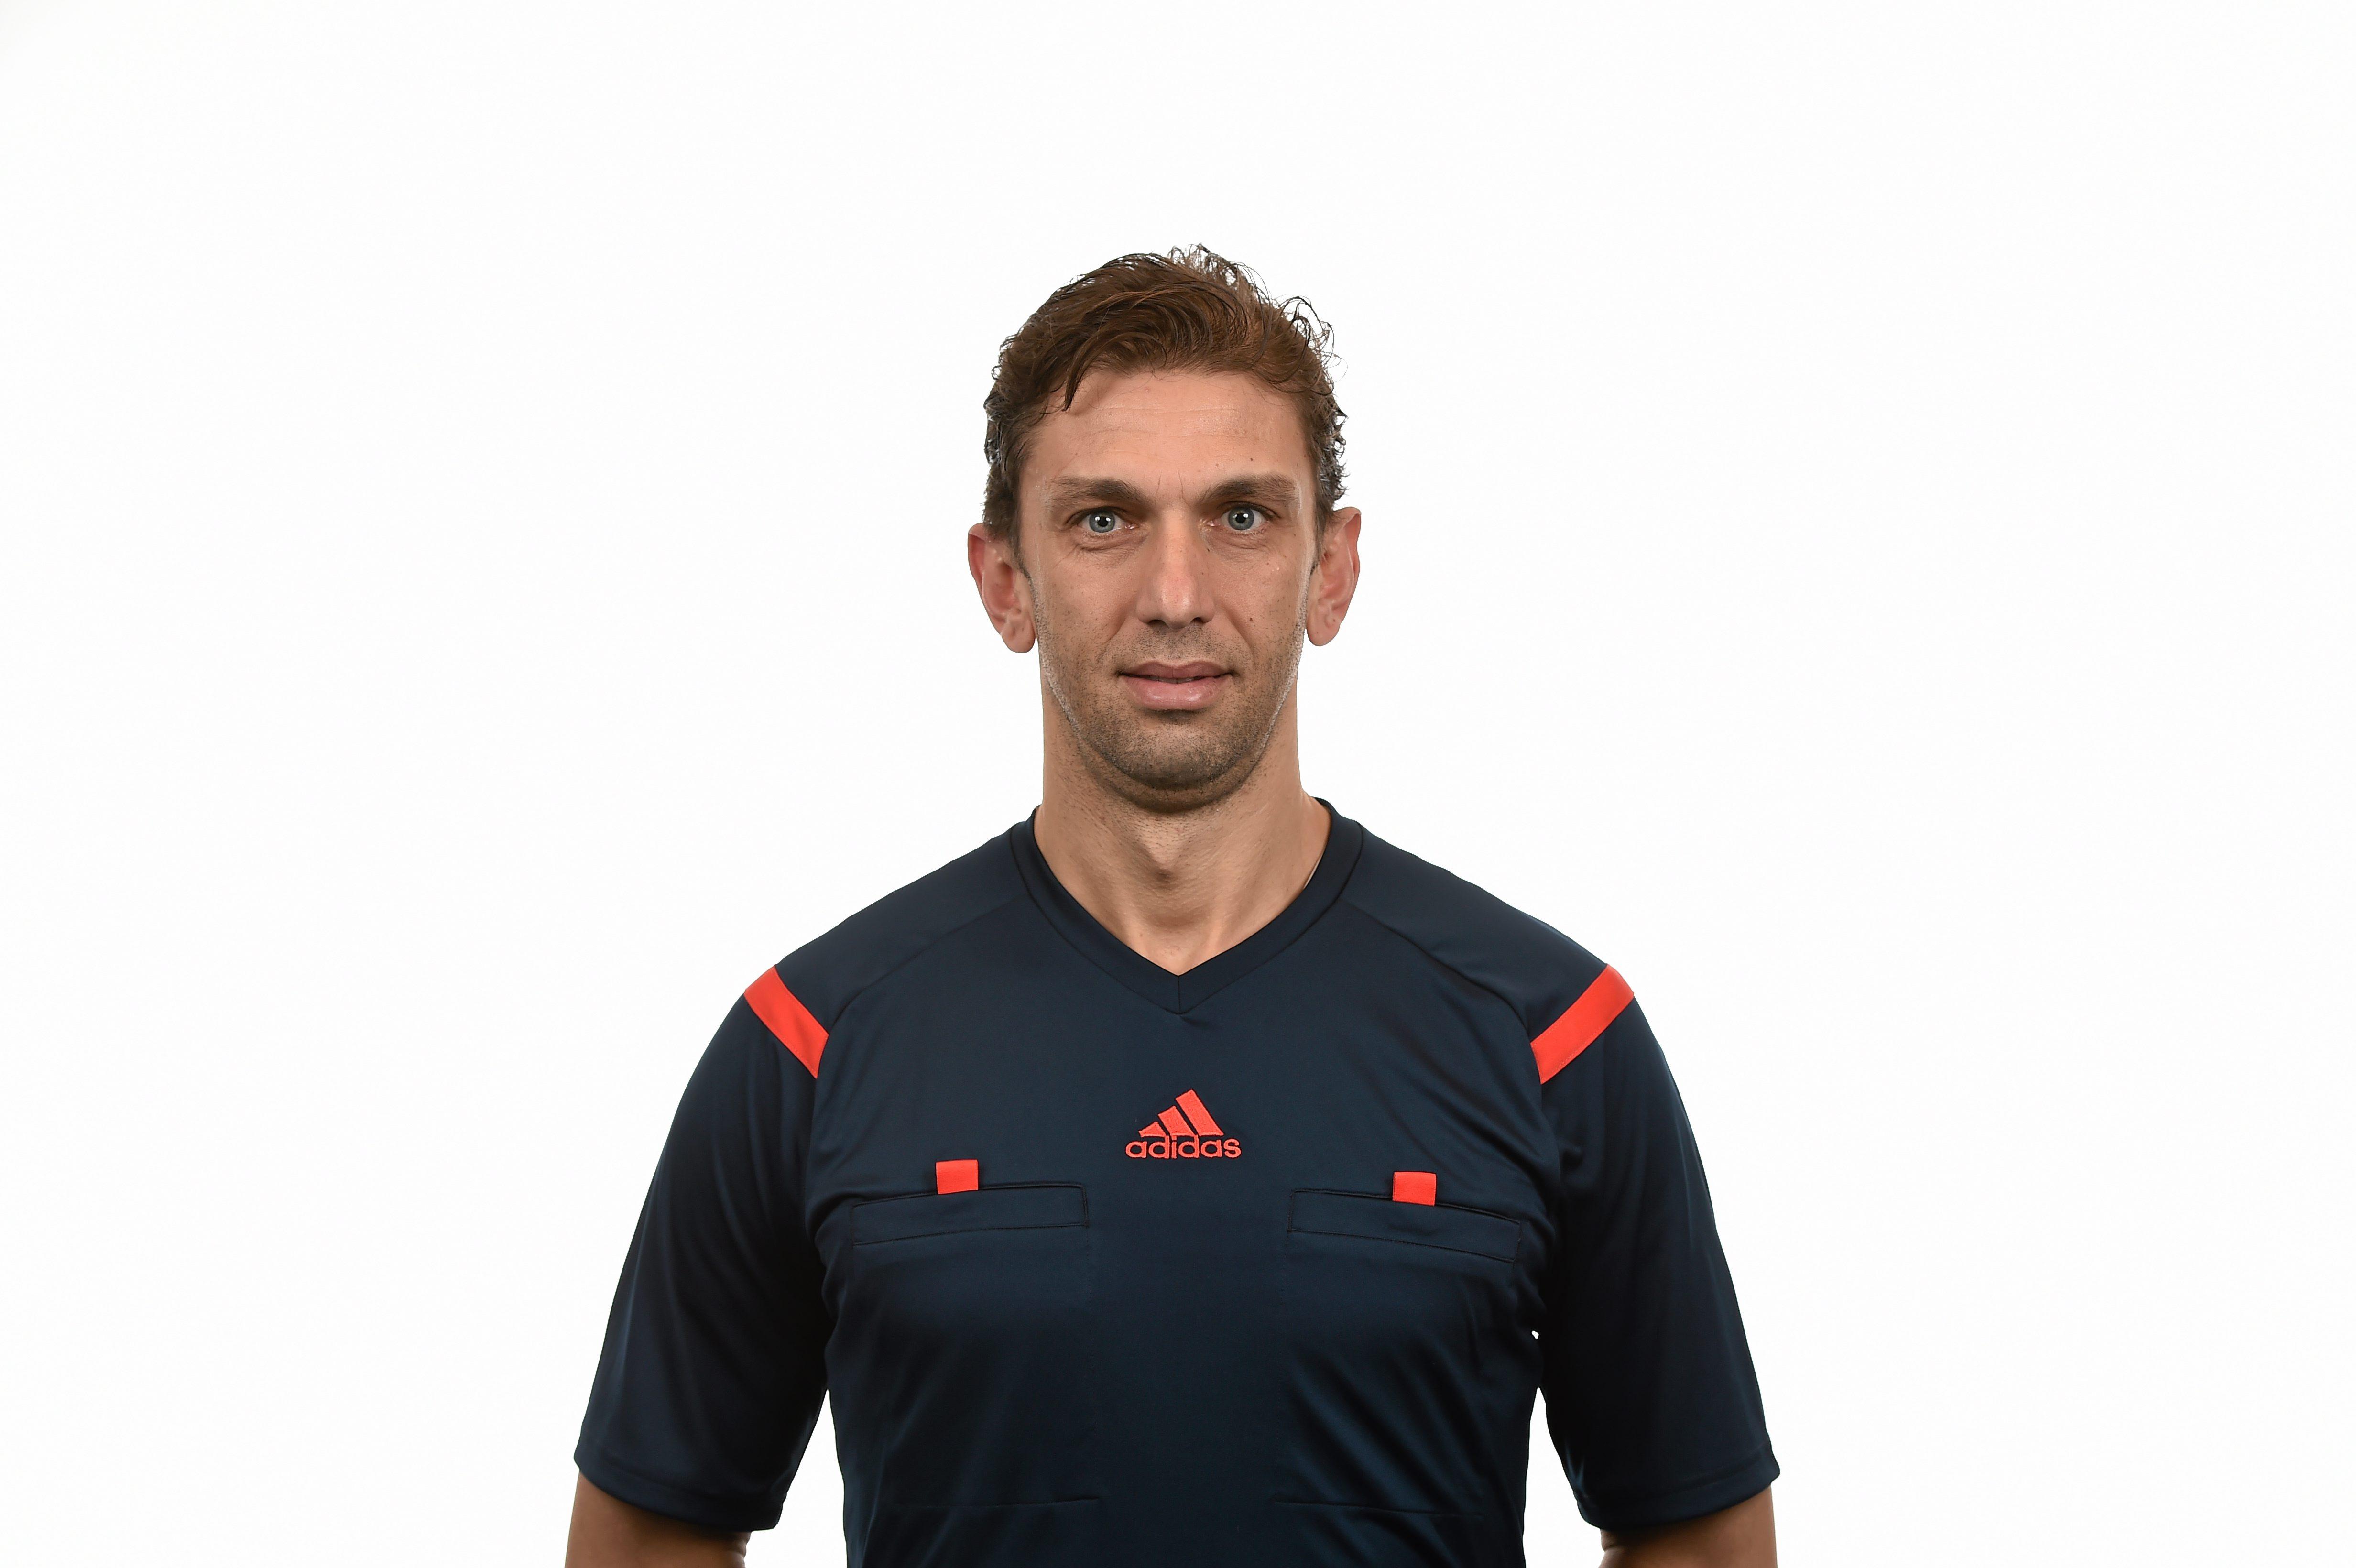 UEFA Referee Paolo Tagliavento of Italy